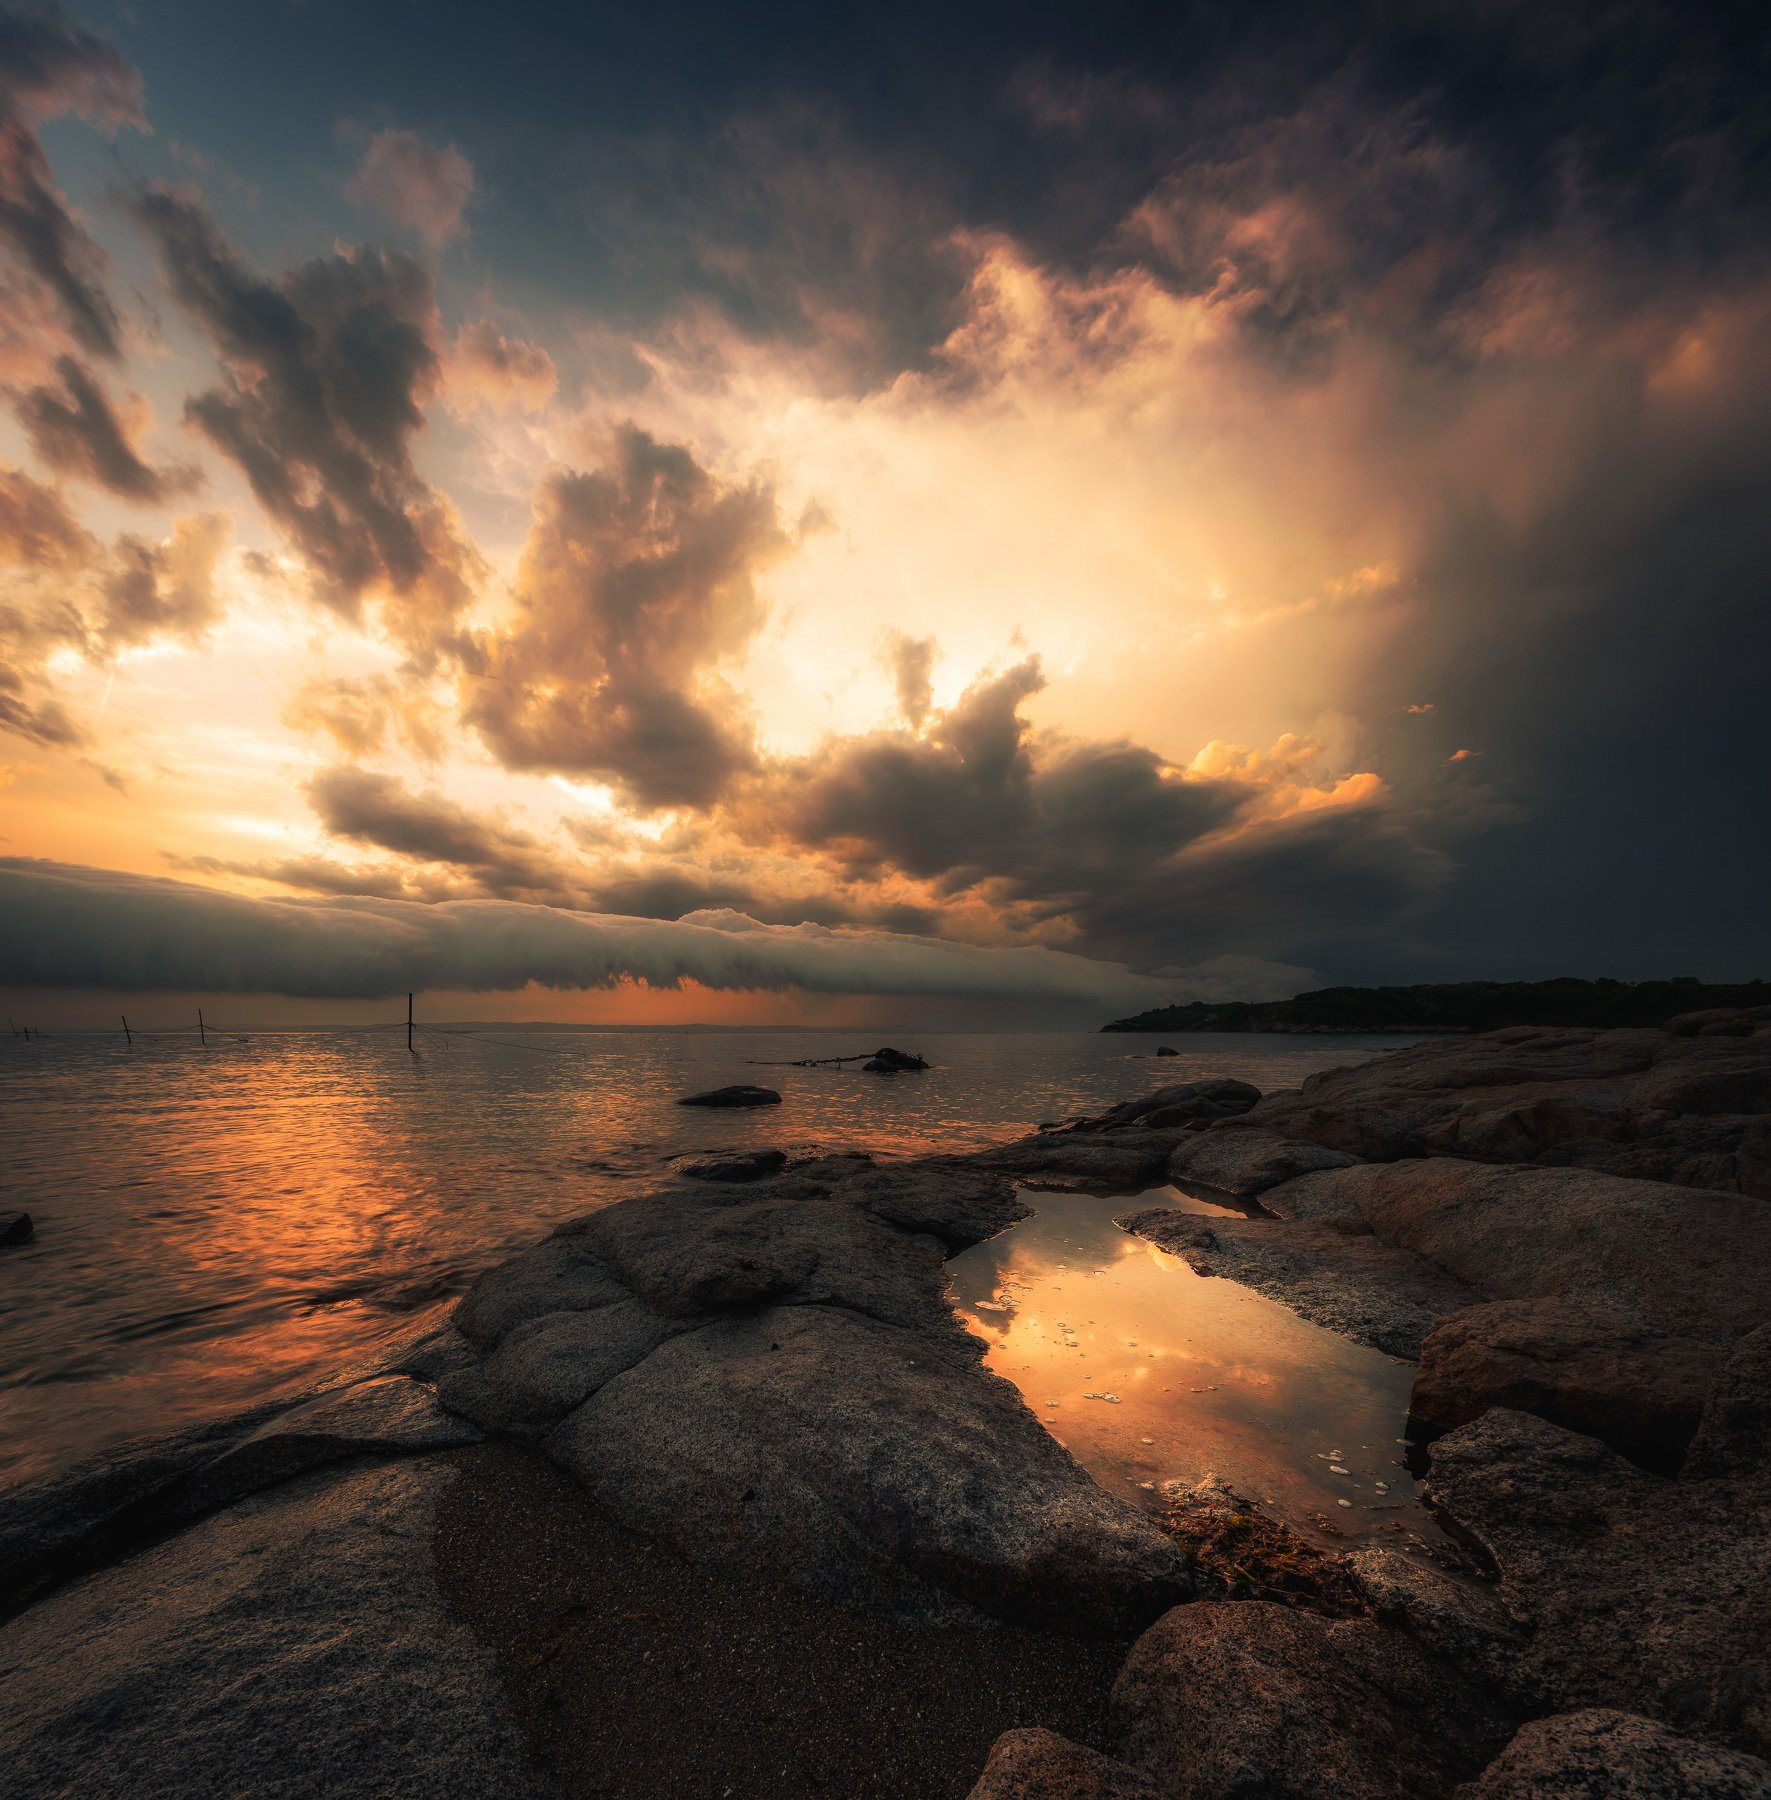 nature,sea, landscape, storm, cloud,sunset, water, Jeni Madjarova